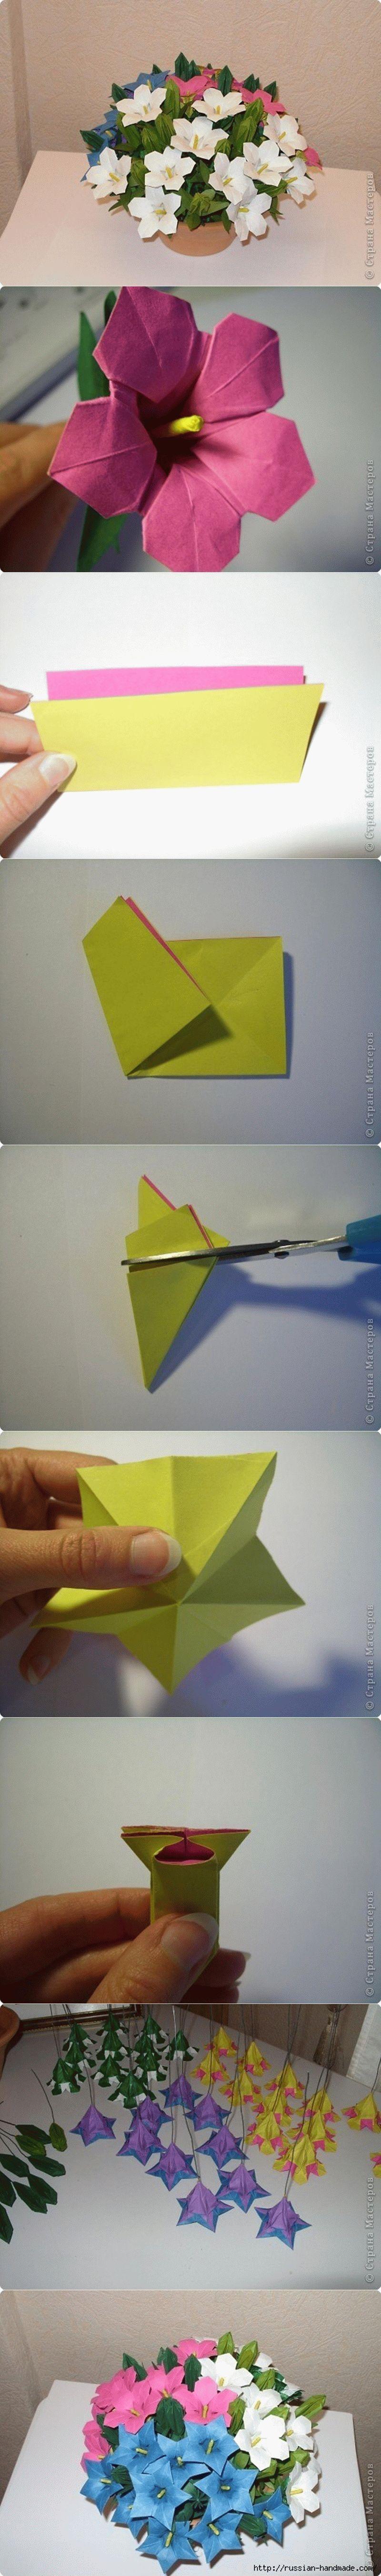 Diy beautiful paper origami lily flower bouquet flores pinterest diy beautiful paper origami lily flower bouquet izmirmasajfo